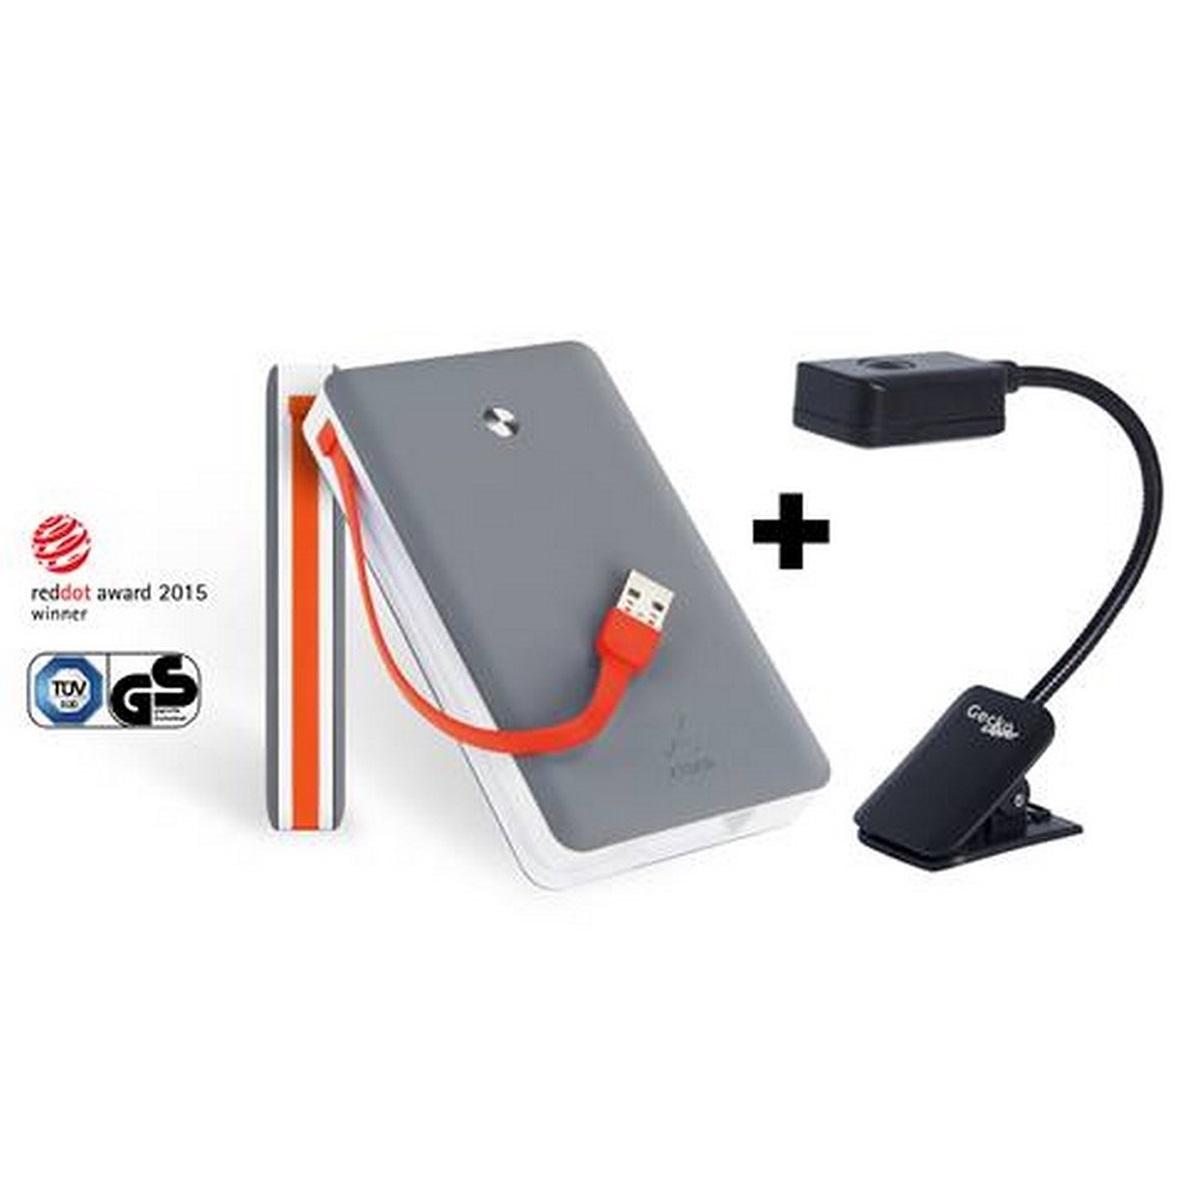 Xtorm Power Bank Free 15.000 mAh + Clipper Leeslamp voor €34,95